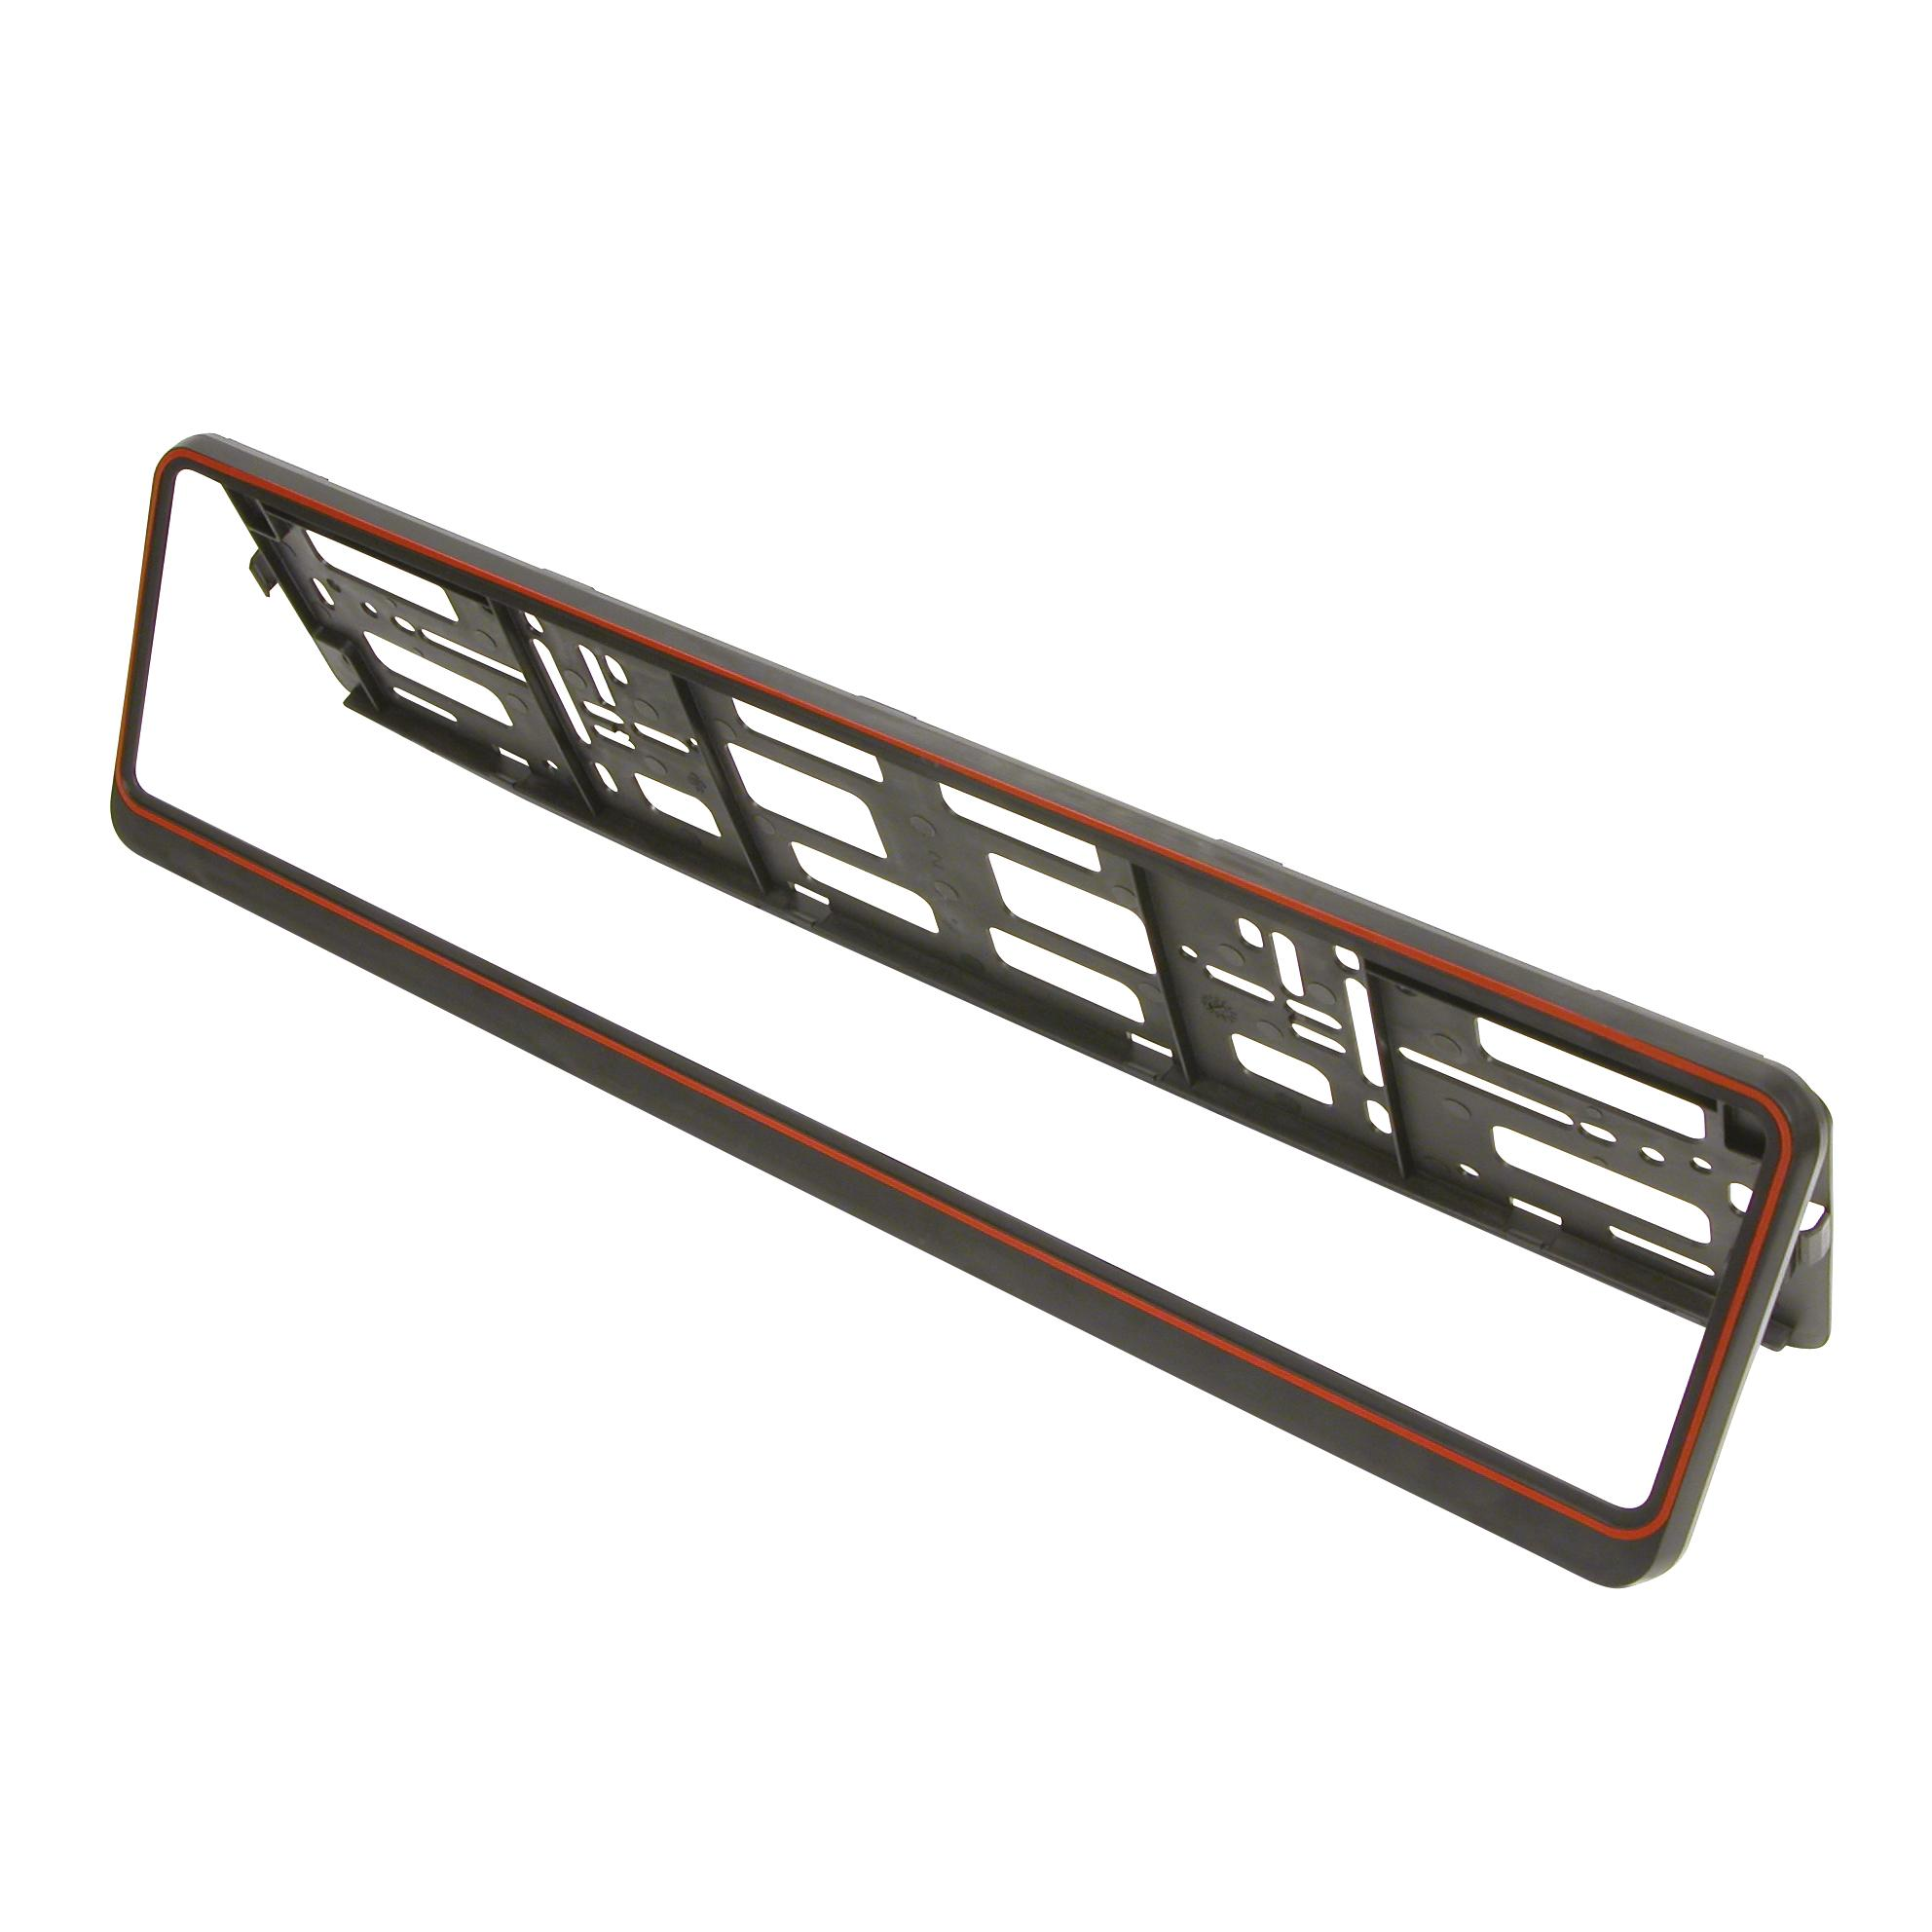 plaques immatriculation adnautomid porte plaque immatri 218477. Black Bedroom Furniture Sets. Home Design Ideas